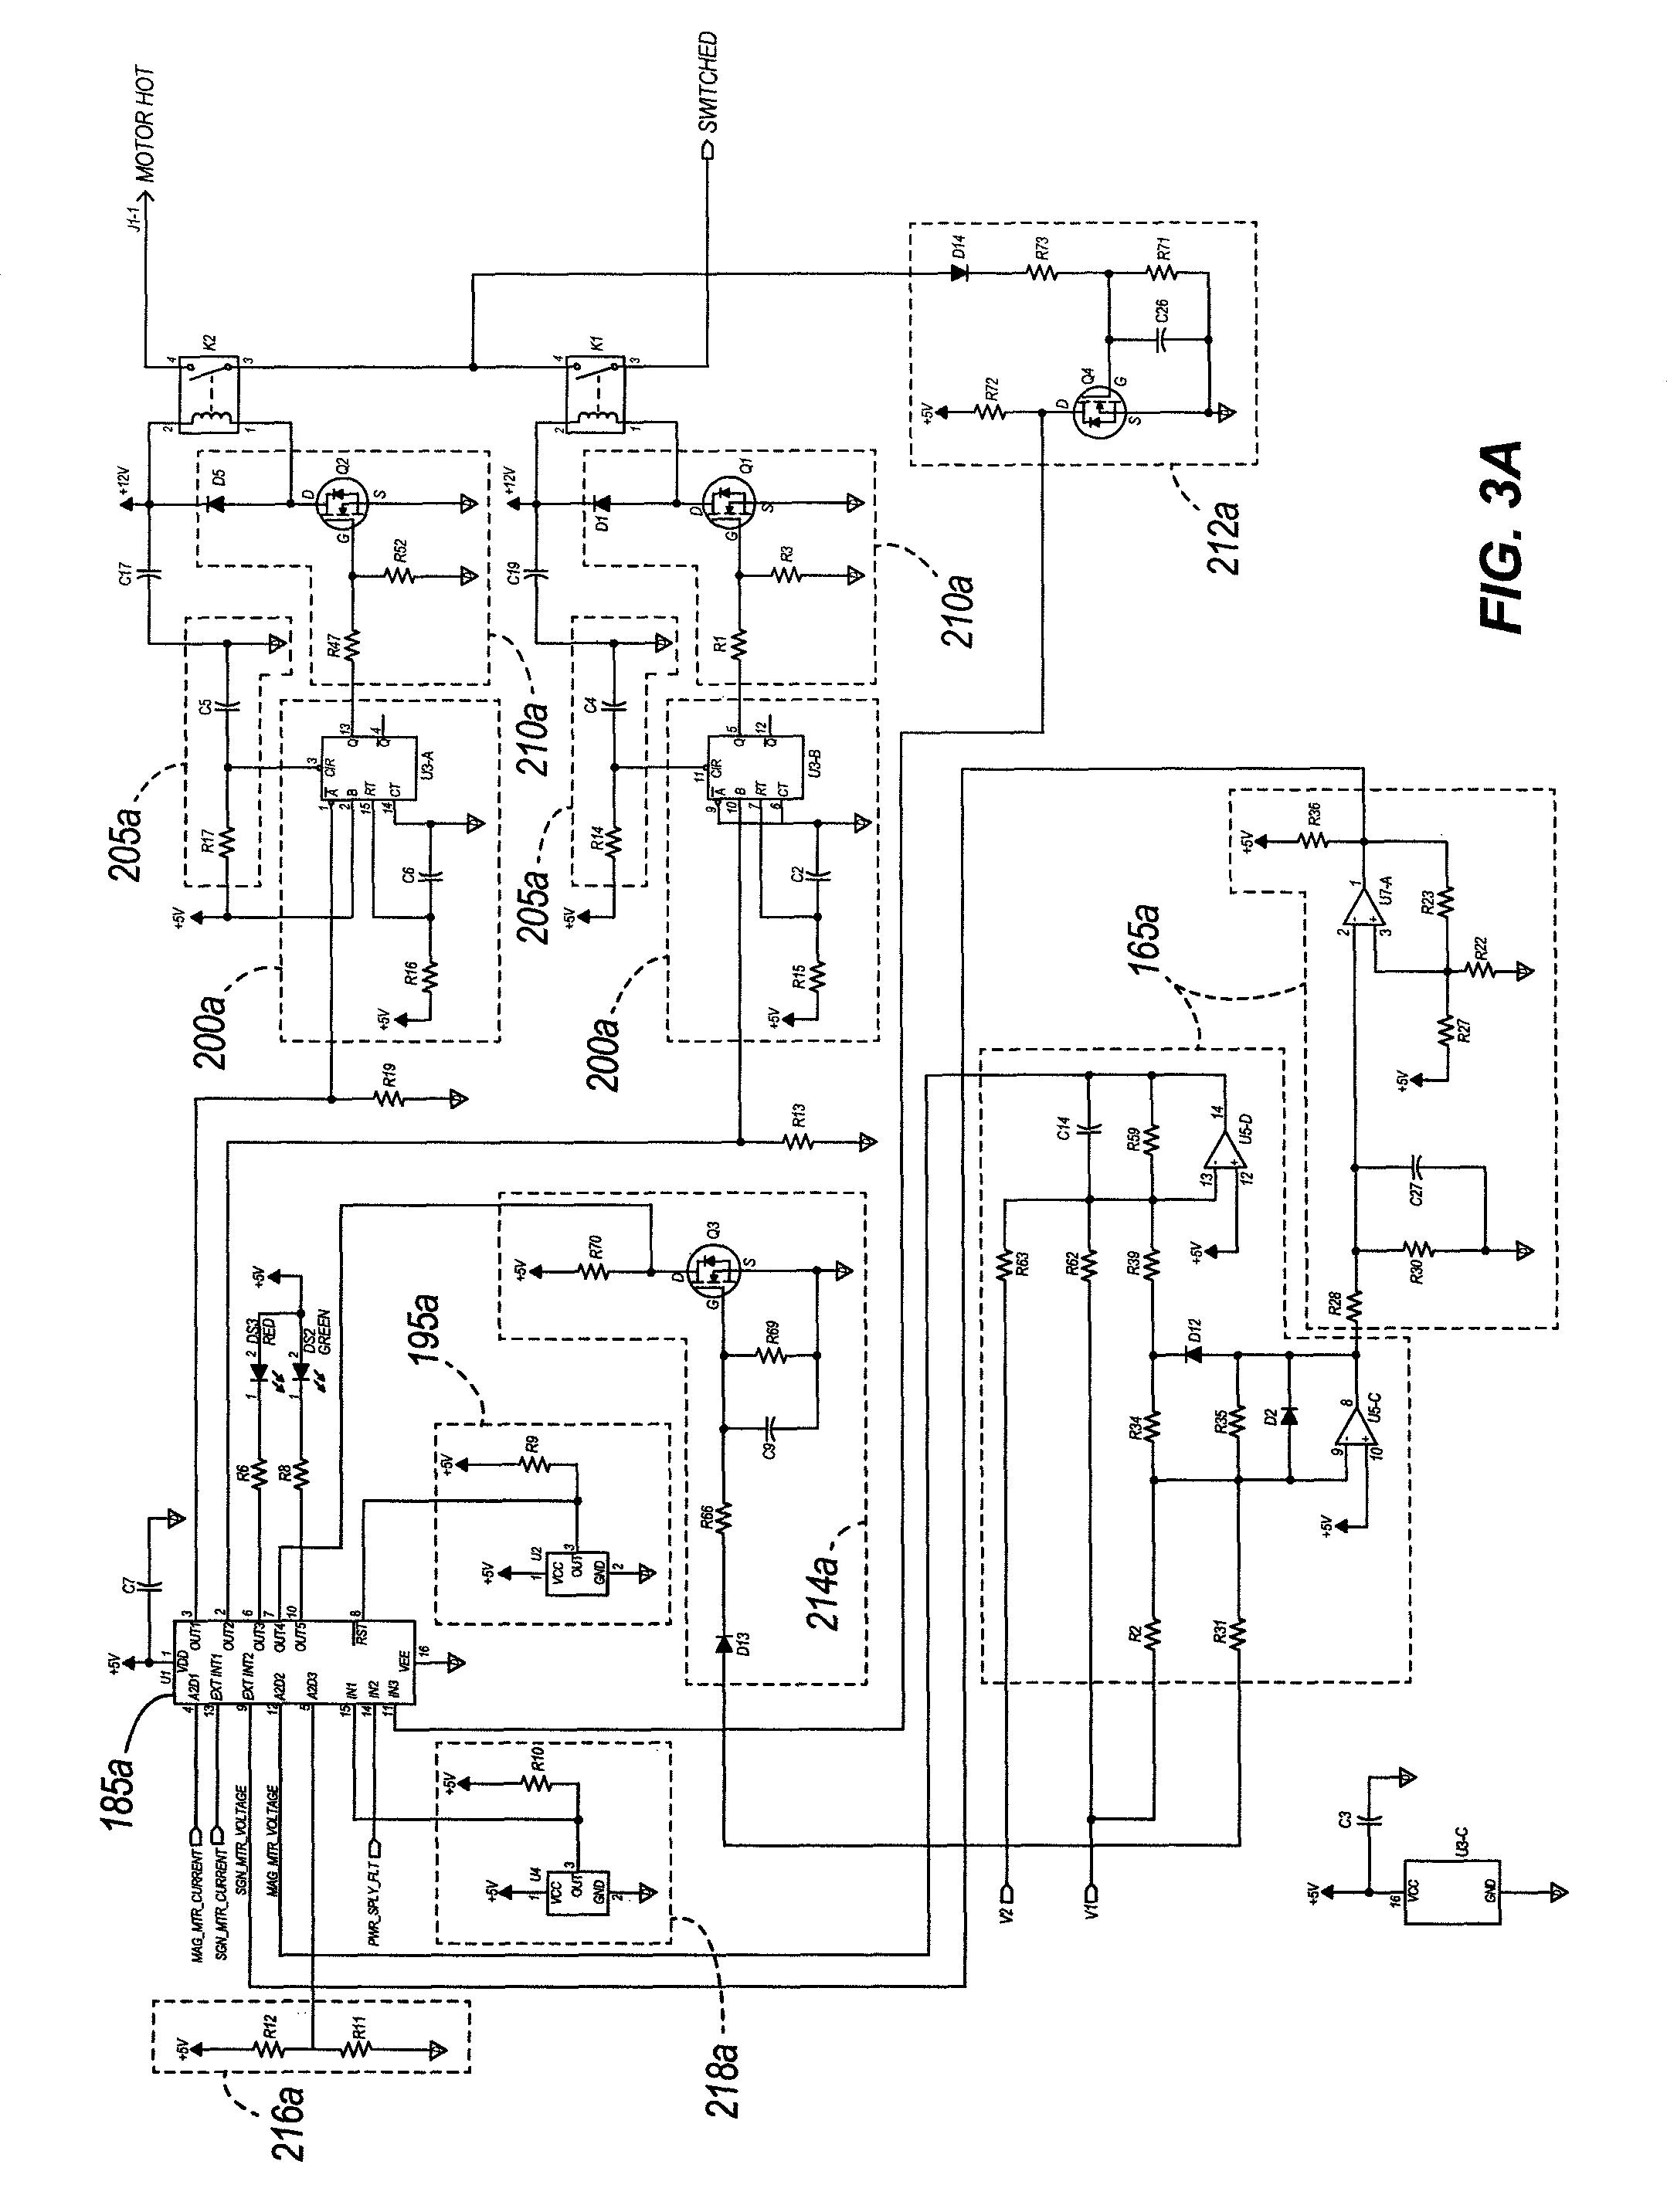 Ingersoll Wiring Diagrams, Ingersoll, Free Engine Image